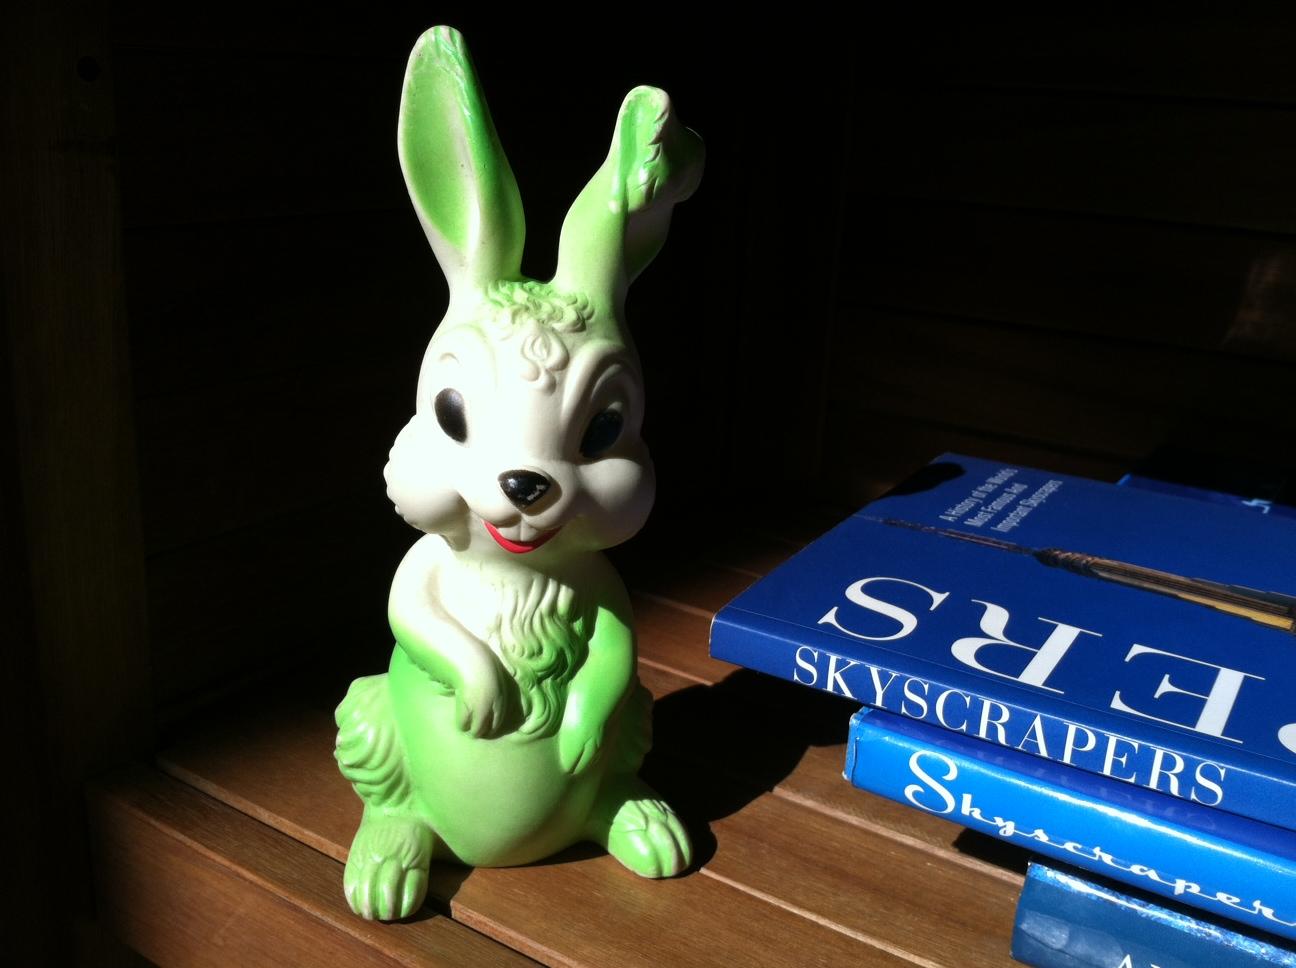 A vintage rubber bunny